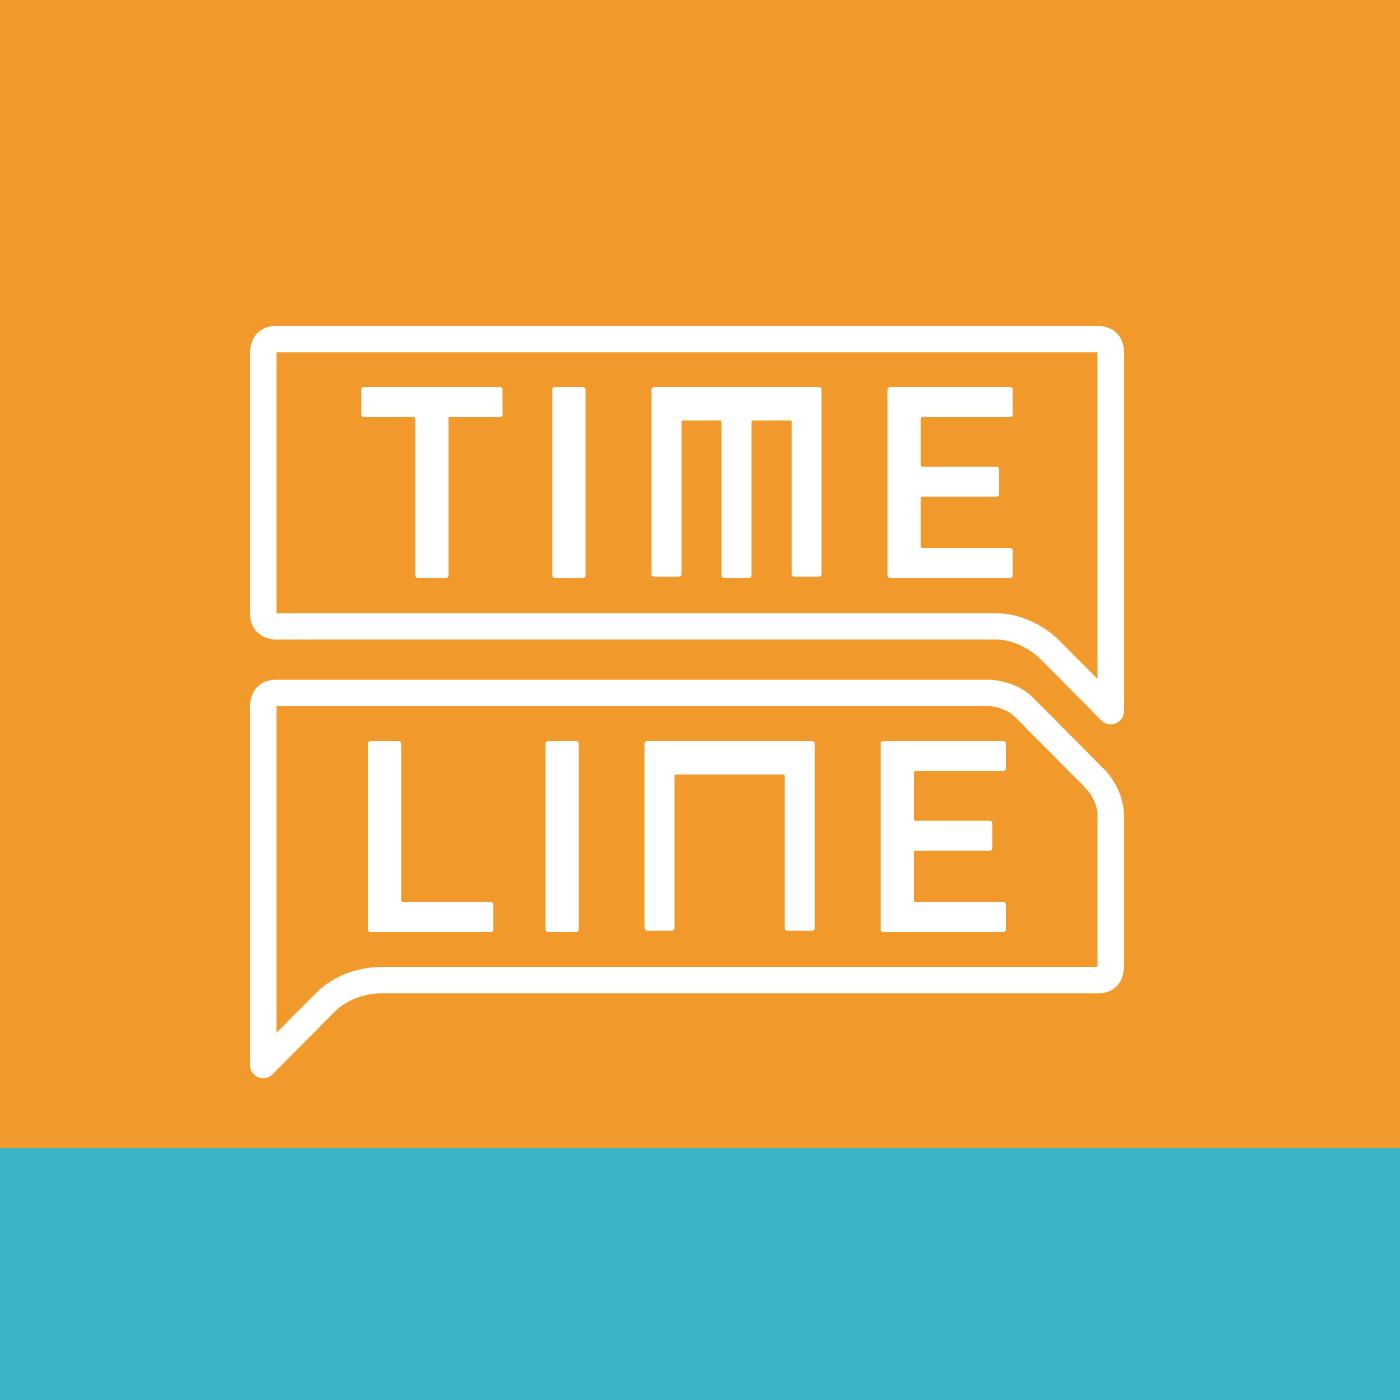 Timeline Gaúcha - 01/11/2016